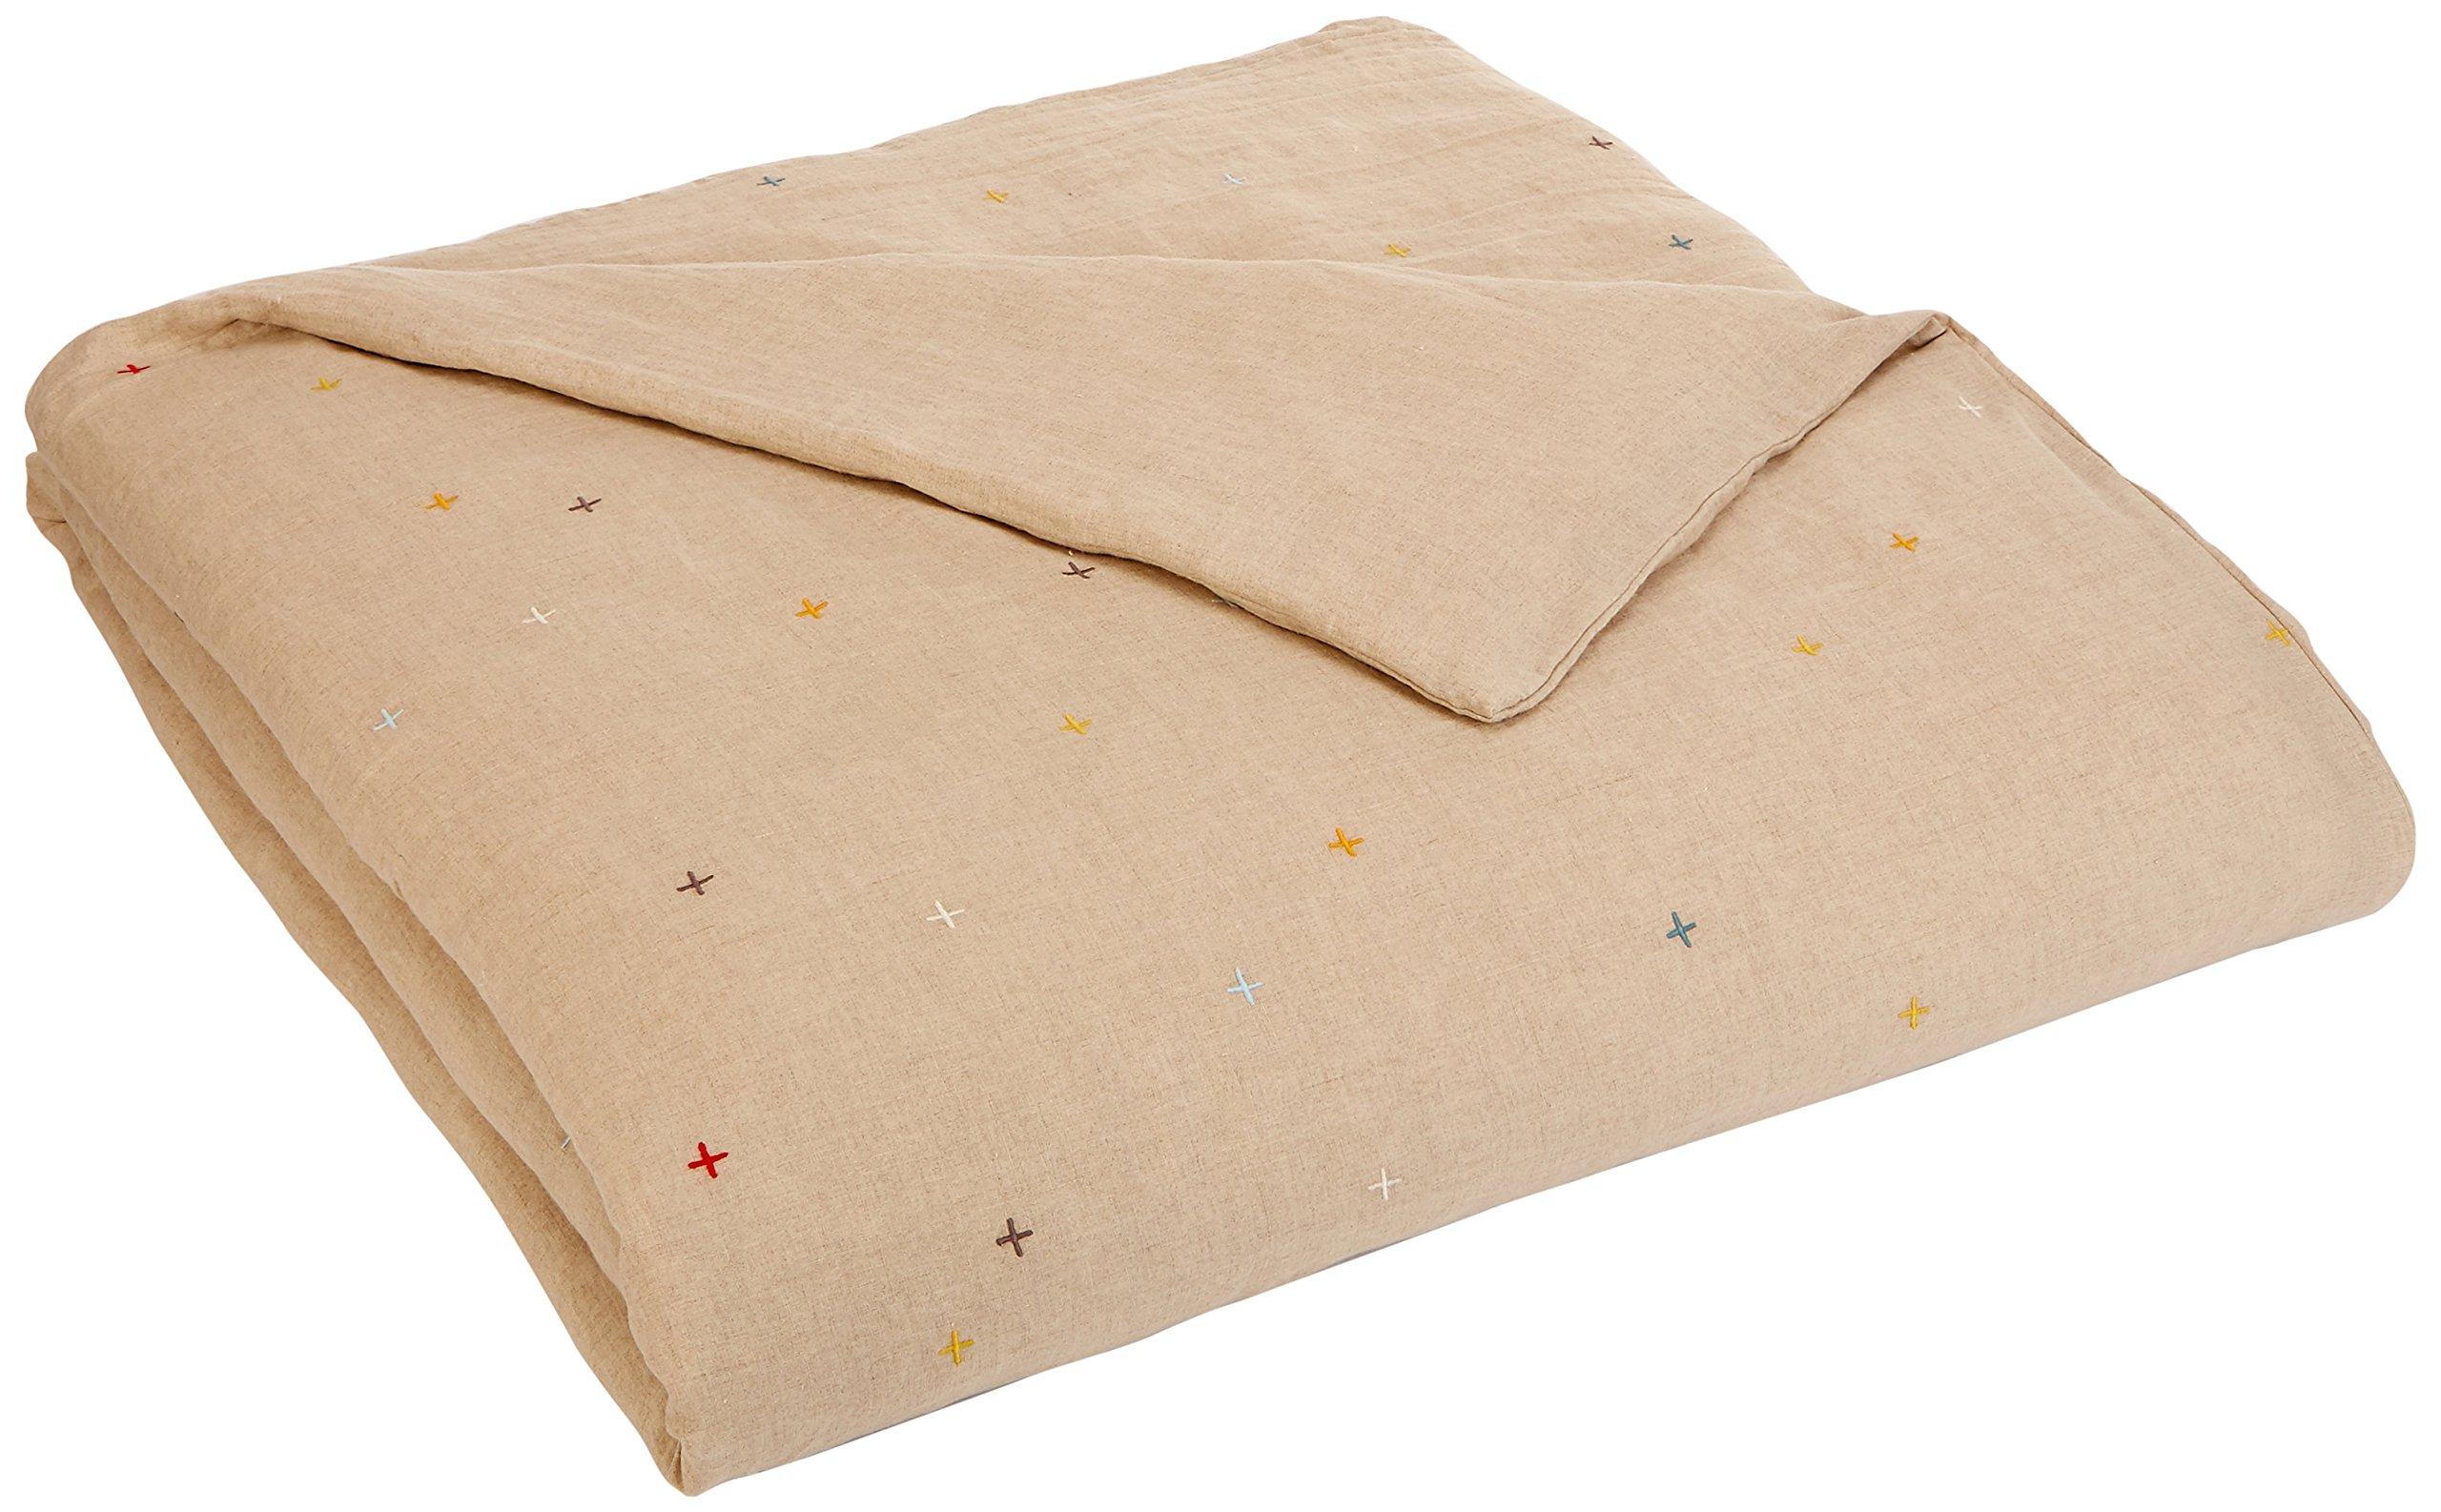 Coyuchi Scattered Embroidered Linen Duvet, Full/Queen, Undyed Linen w/Multi